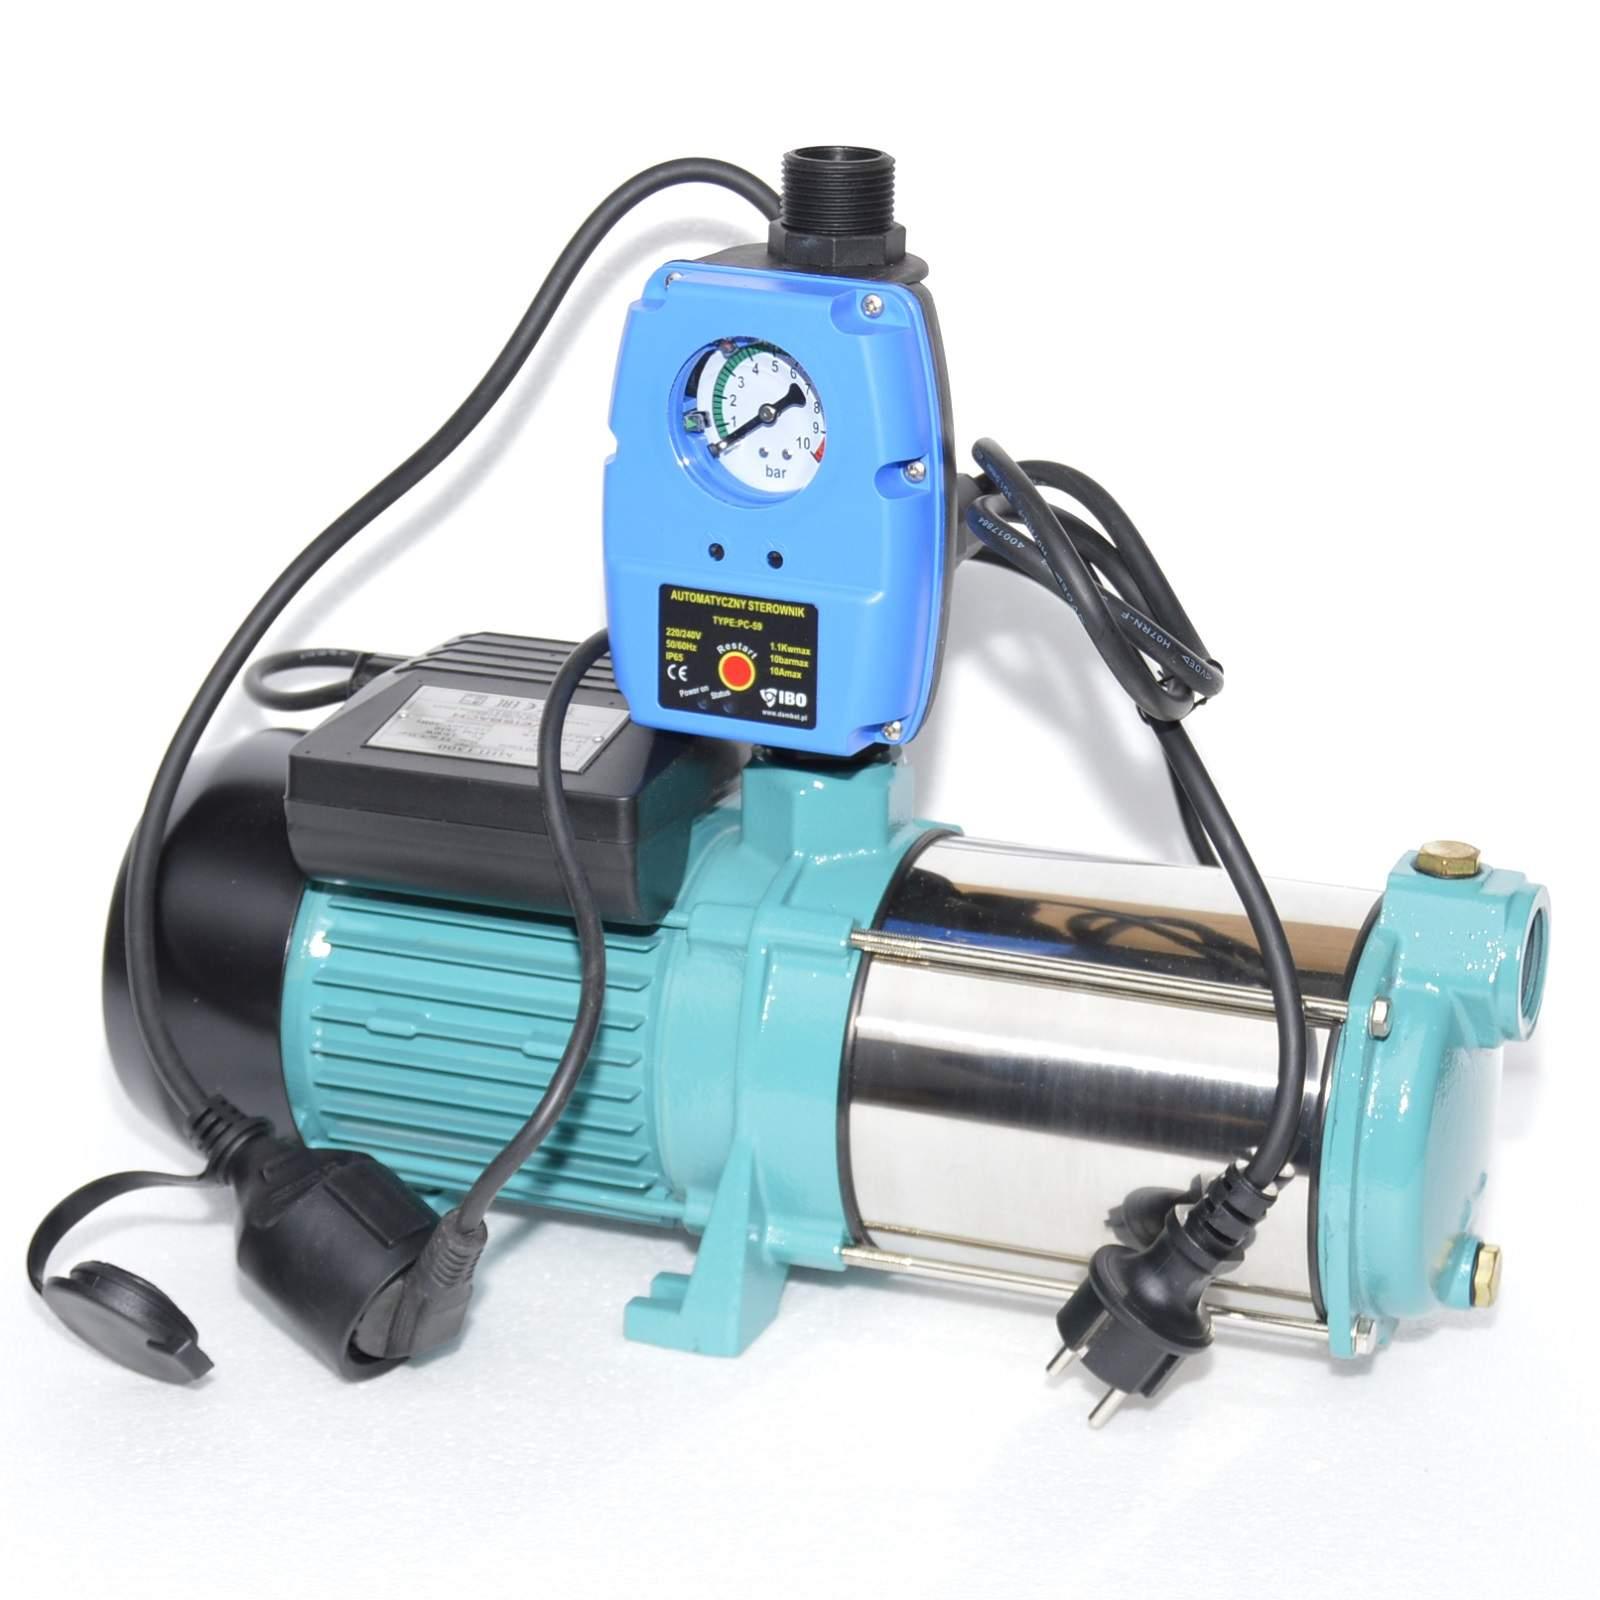 garten pumpe luxus kreiselpumpe hauswasserwerk gartenpumpe 1300 watt 6000 l h 5 5 bar of garten pumpe